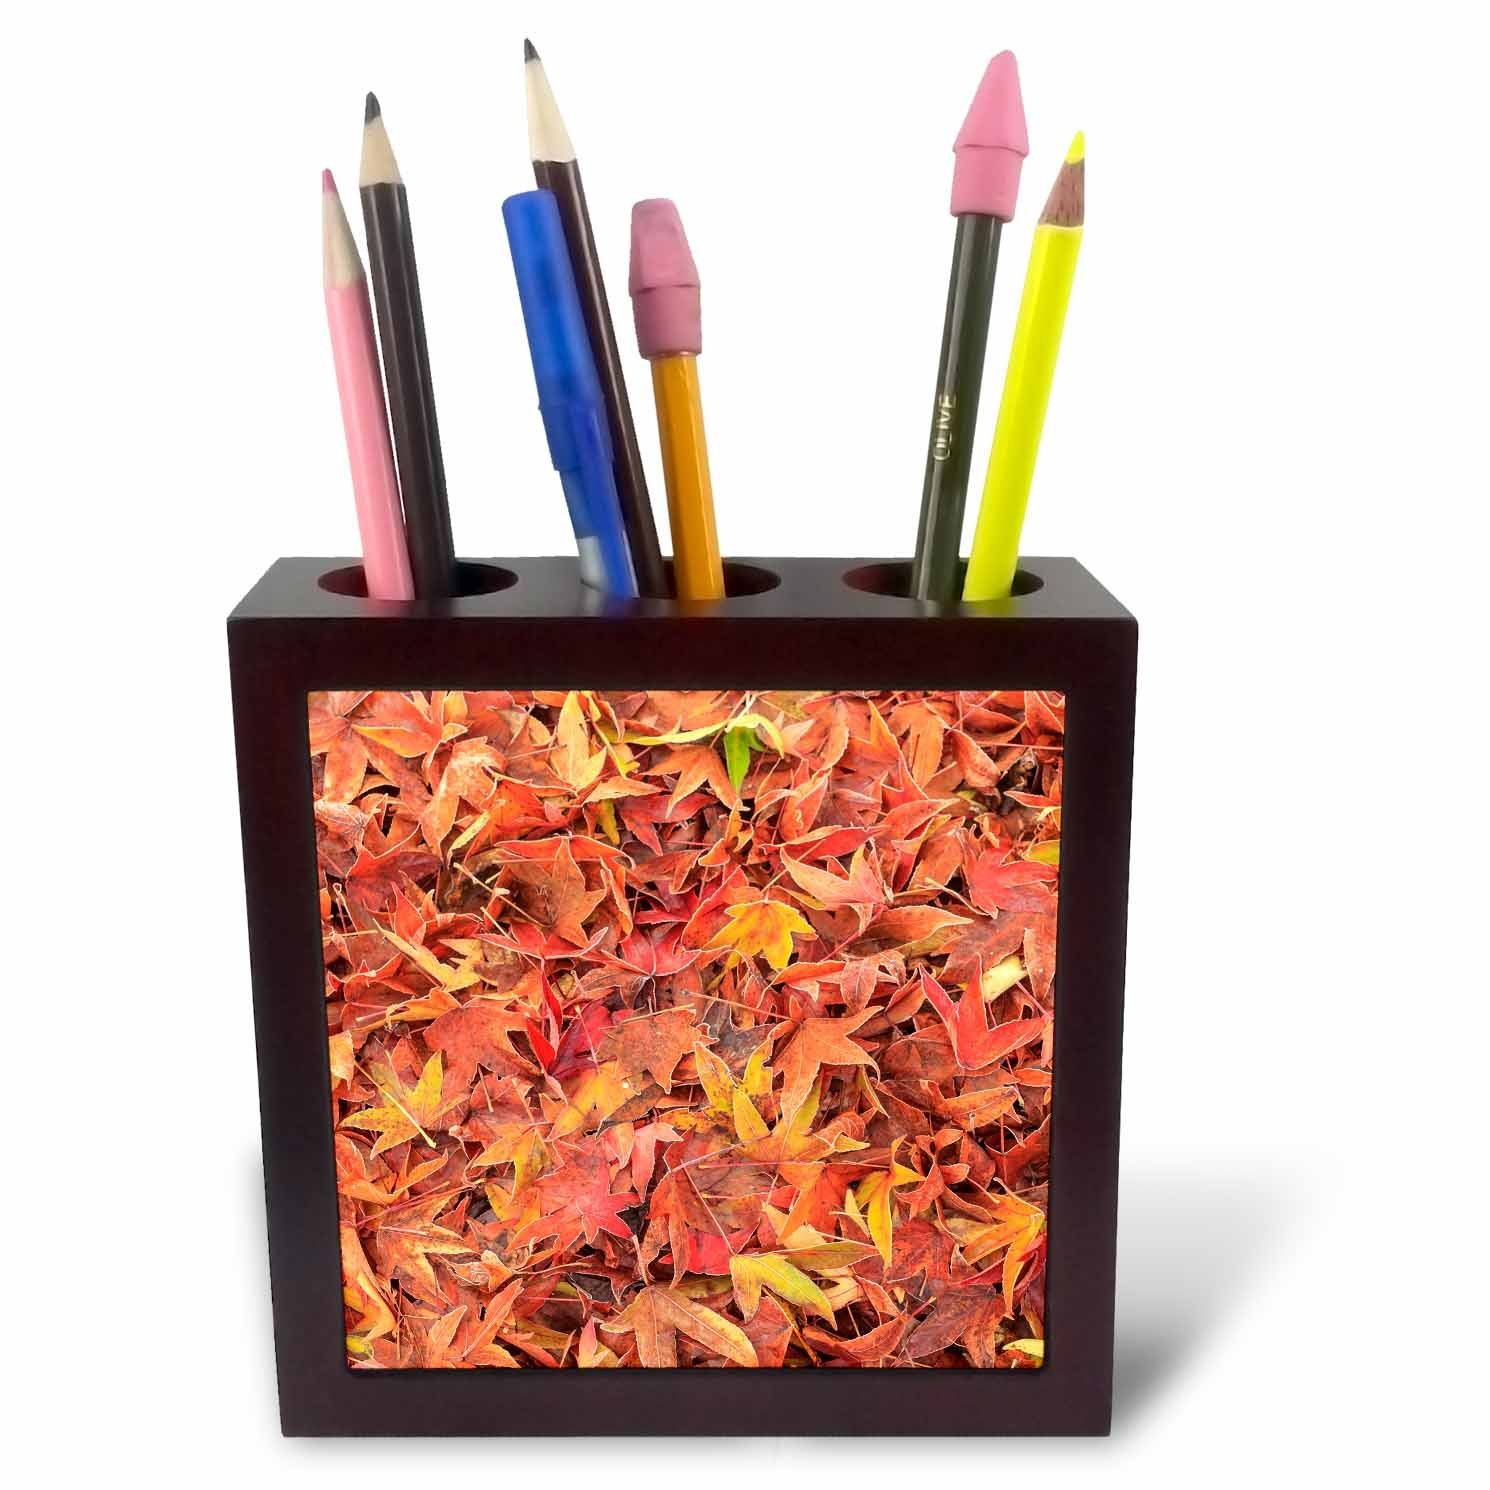 Danita Delimont - Autumn - Autumn color, maple leaves, Mill Creek, Washington State, USA - 5 inch tile pen holder (ph_231821_1)